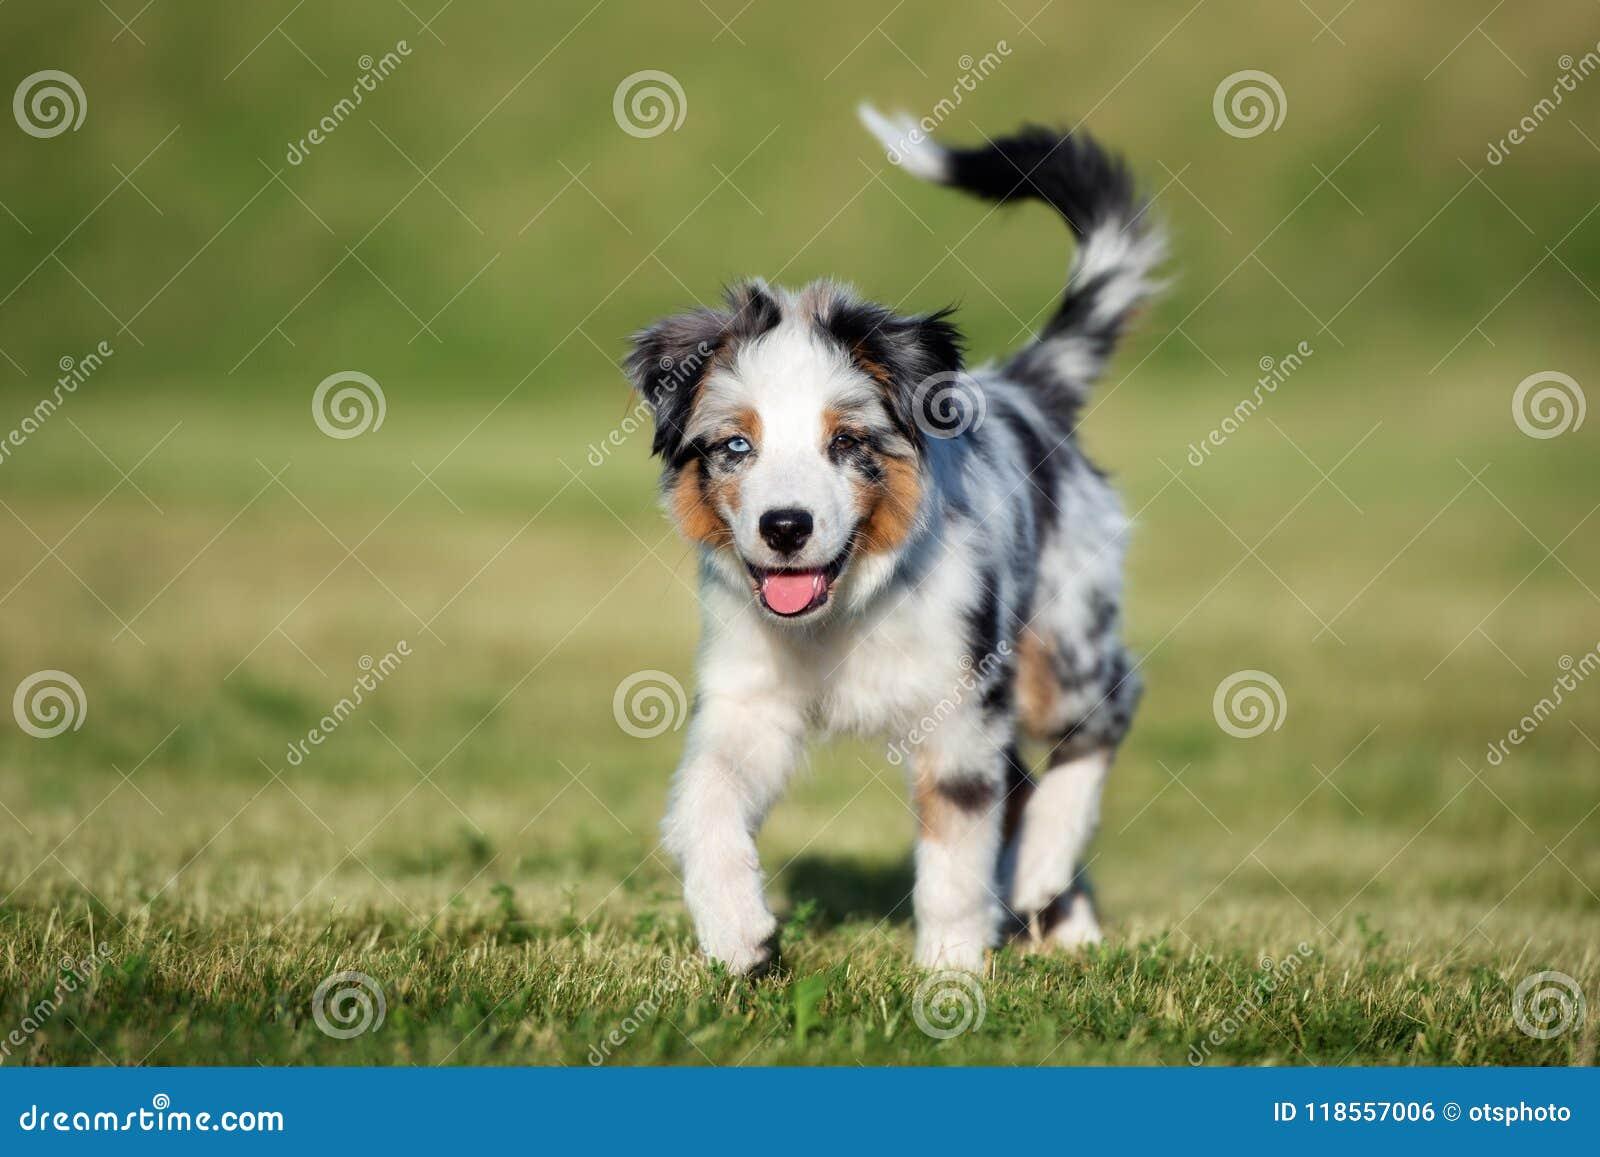 Miniature Australian Shepherd Puppy Outdoors In Summer Stock Photo Image Of Park Aussie 118557006